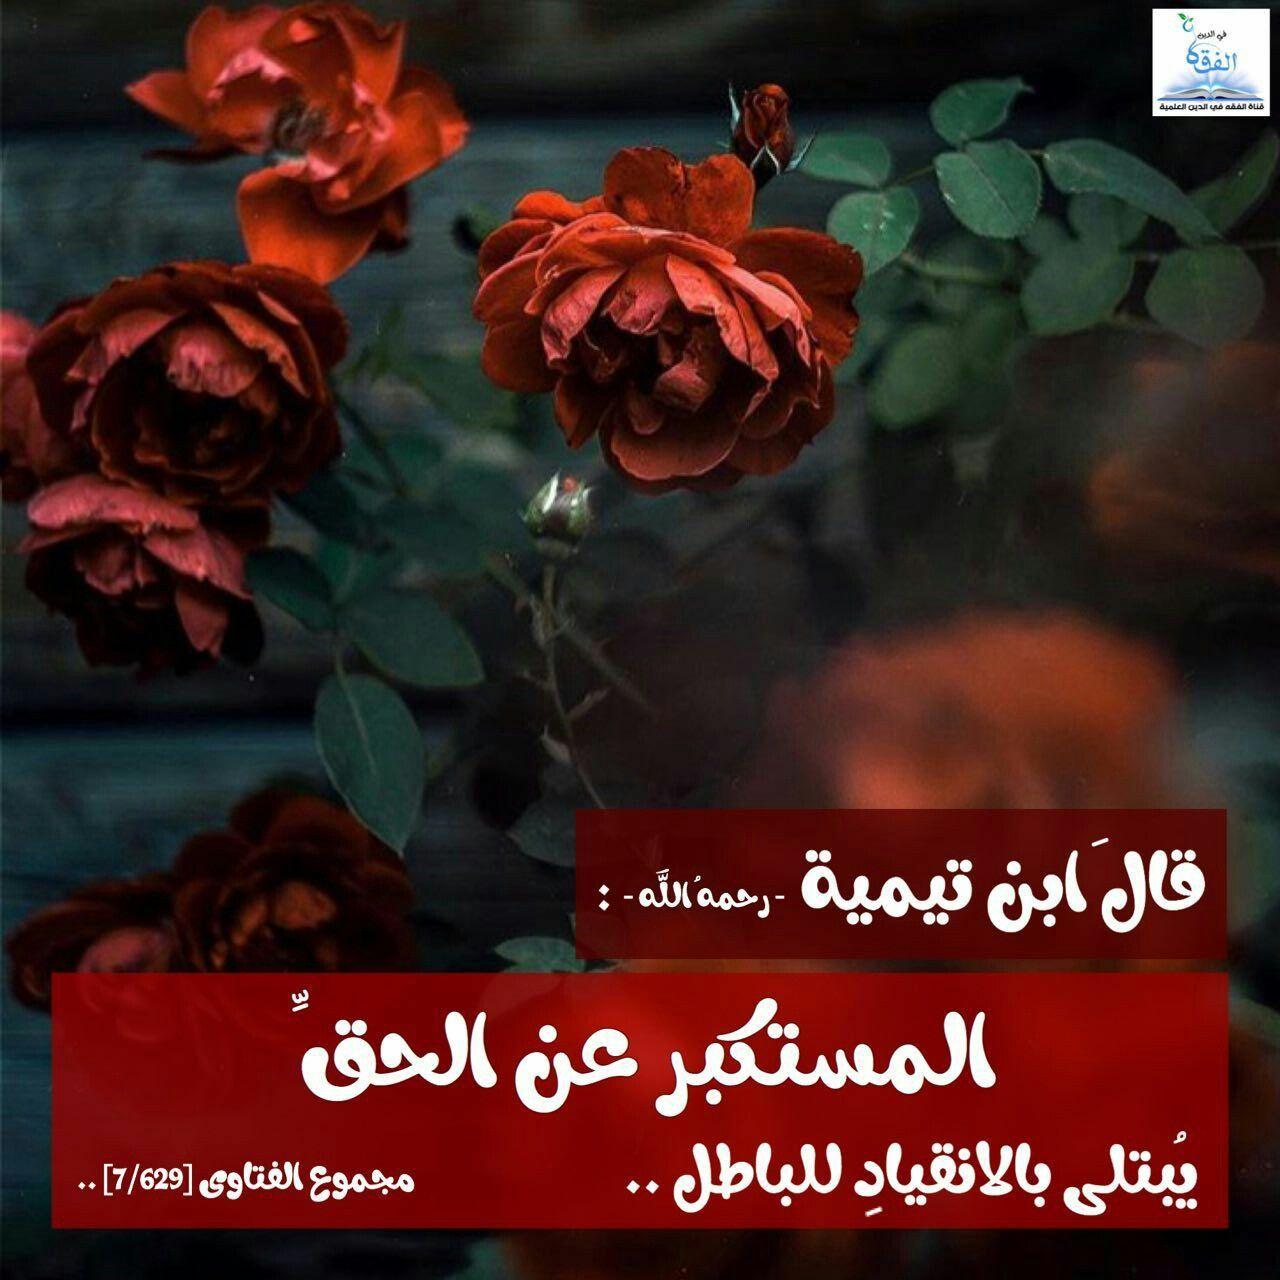 Pin By رياض بوخروبة أبو خديجة On Sante Medecine Islamic Phrases Islamic Quotes Movie Posters